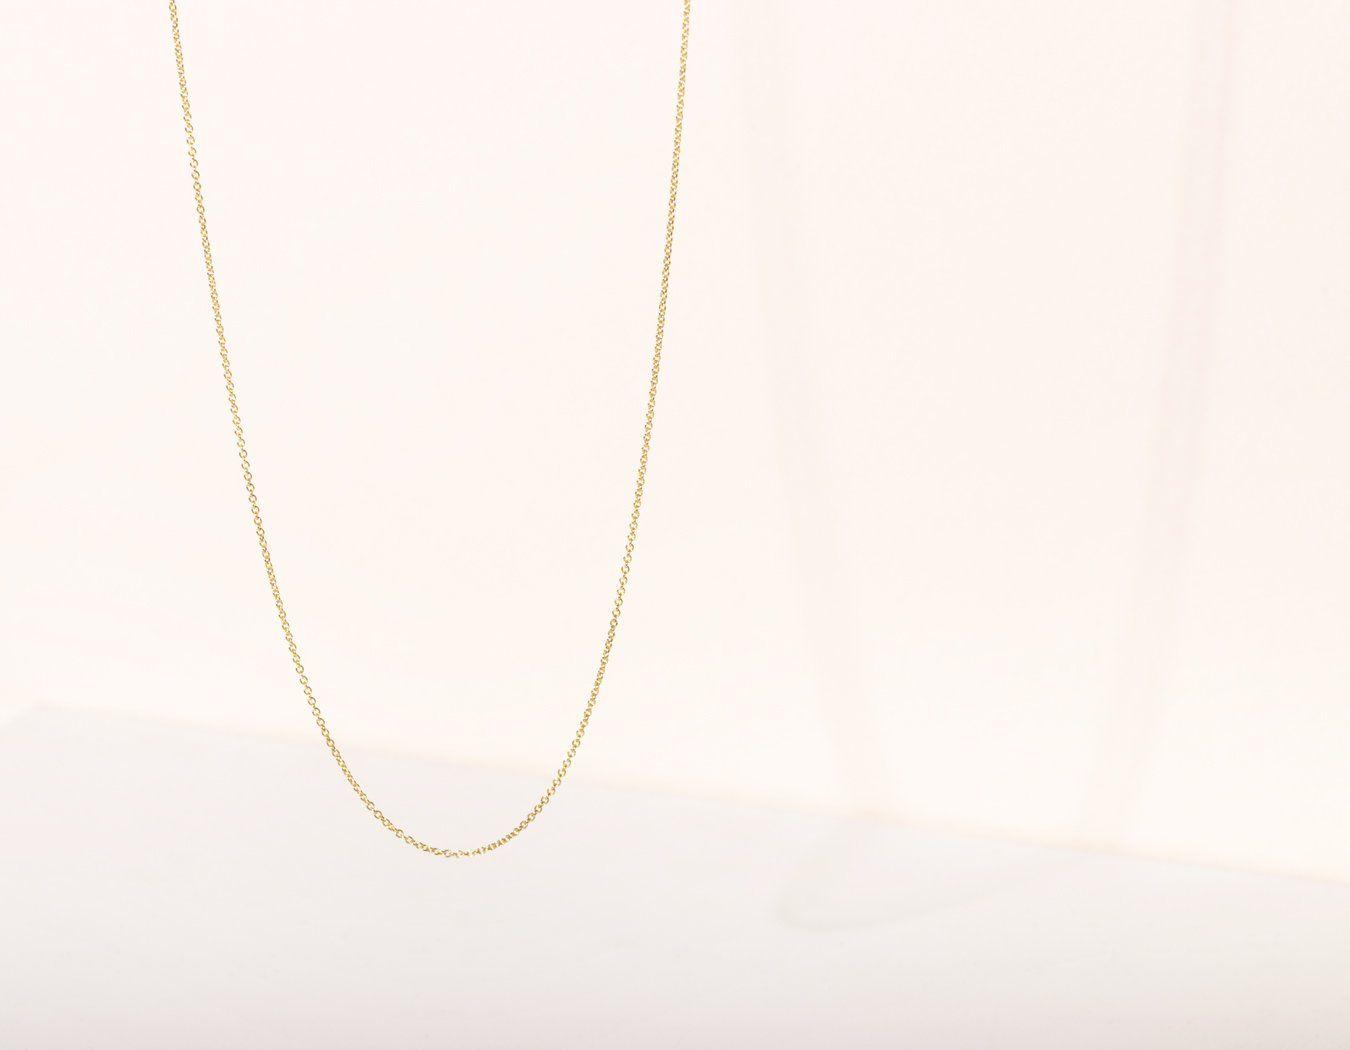 779a96f44b12 Oval Link Chain   Accessory   Jewelry, Gold chain design, Chain